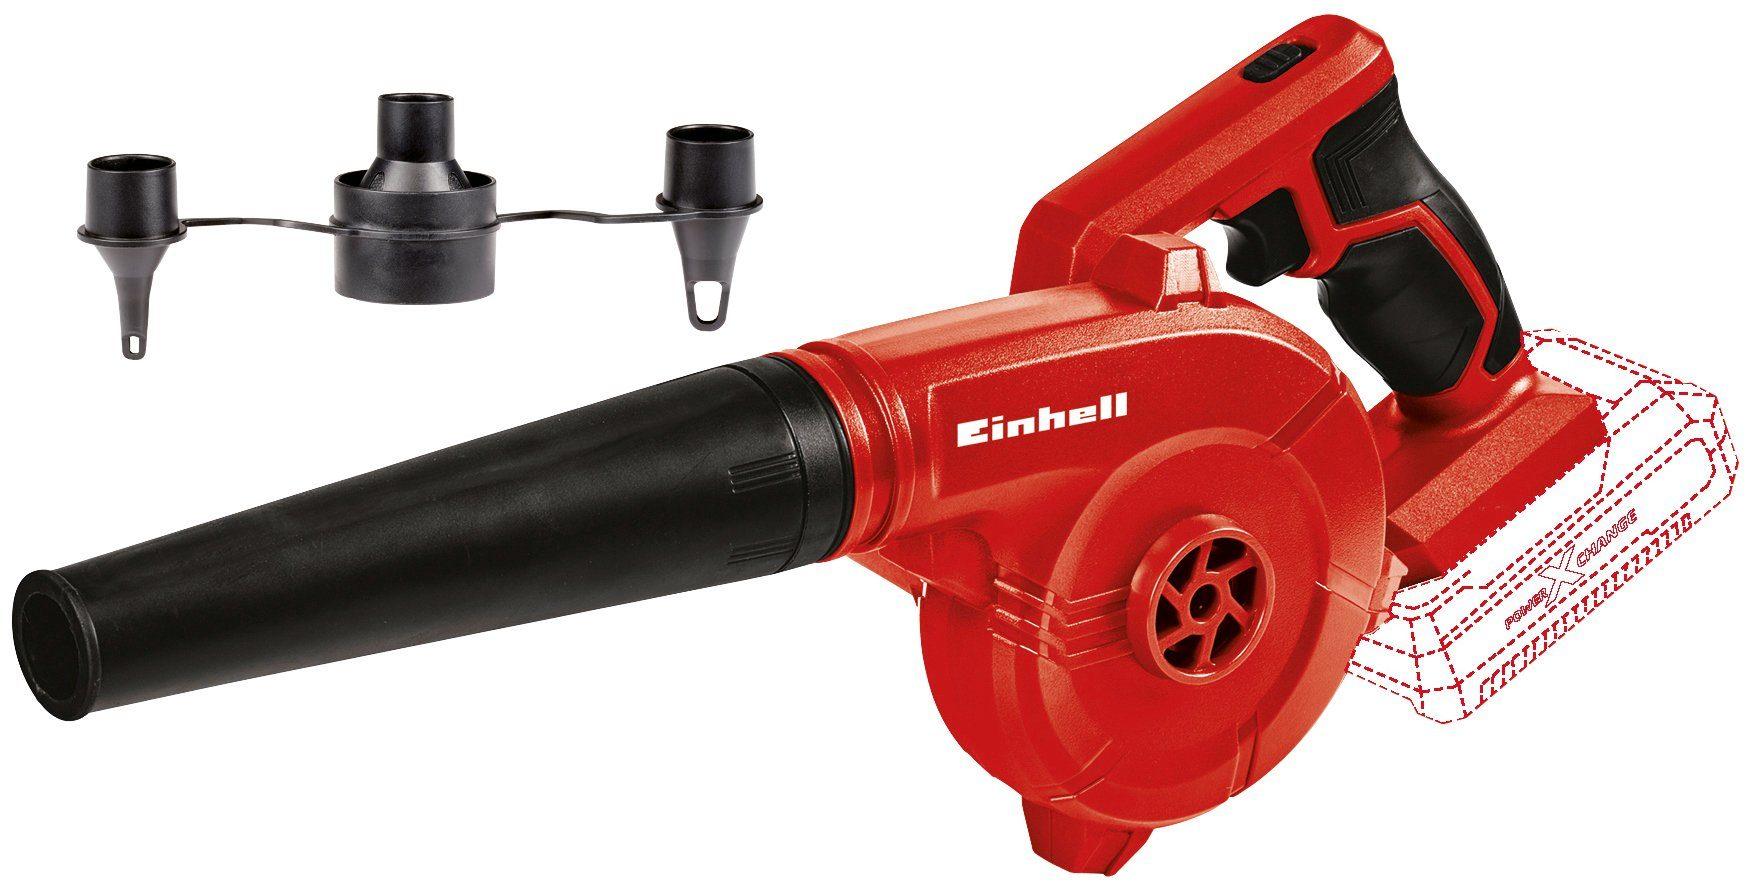 EINHELL Akku-Gebläse »TE-CB 18/180 Li - Solo«, 18 V, ohne Akku und Ladegerät, inkl. Adapter